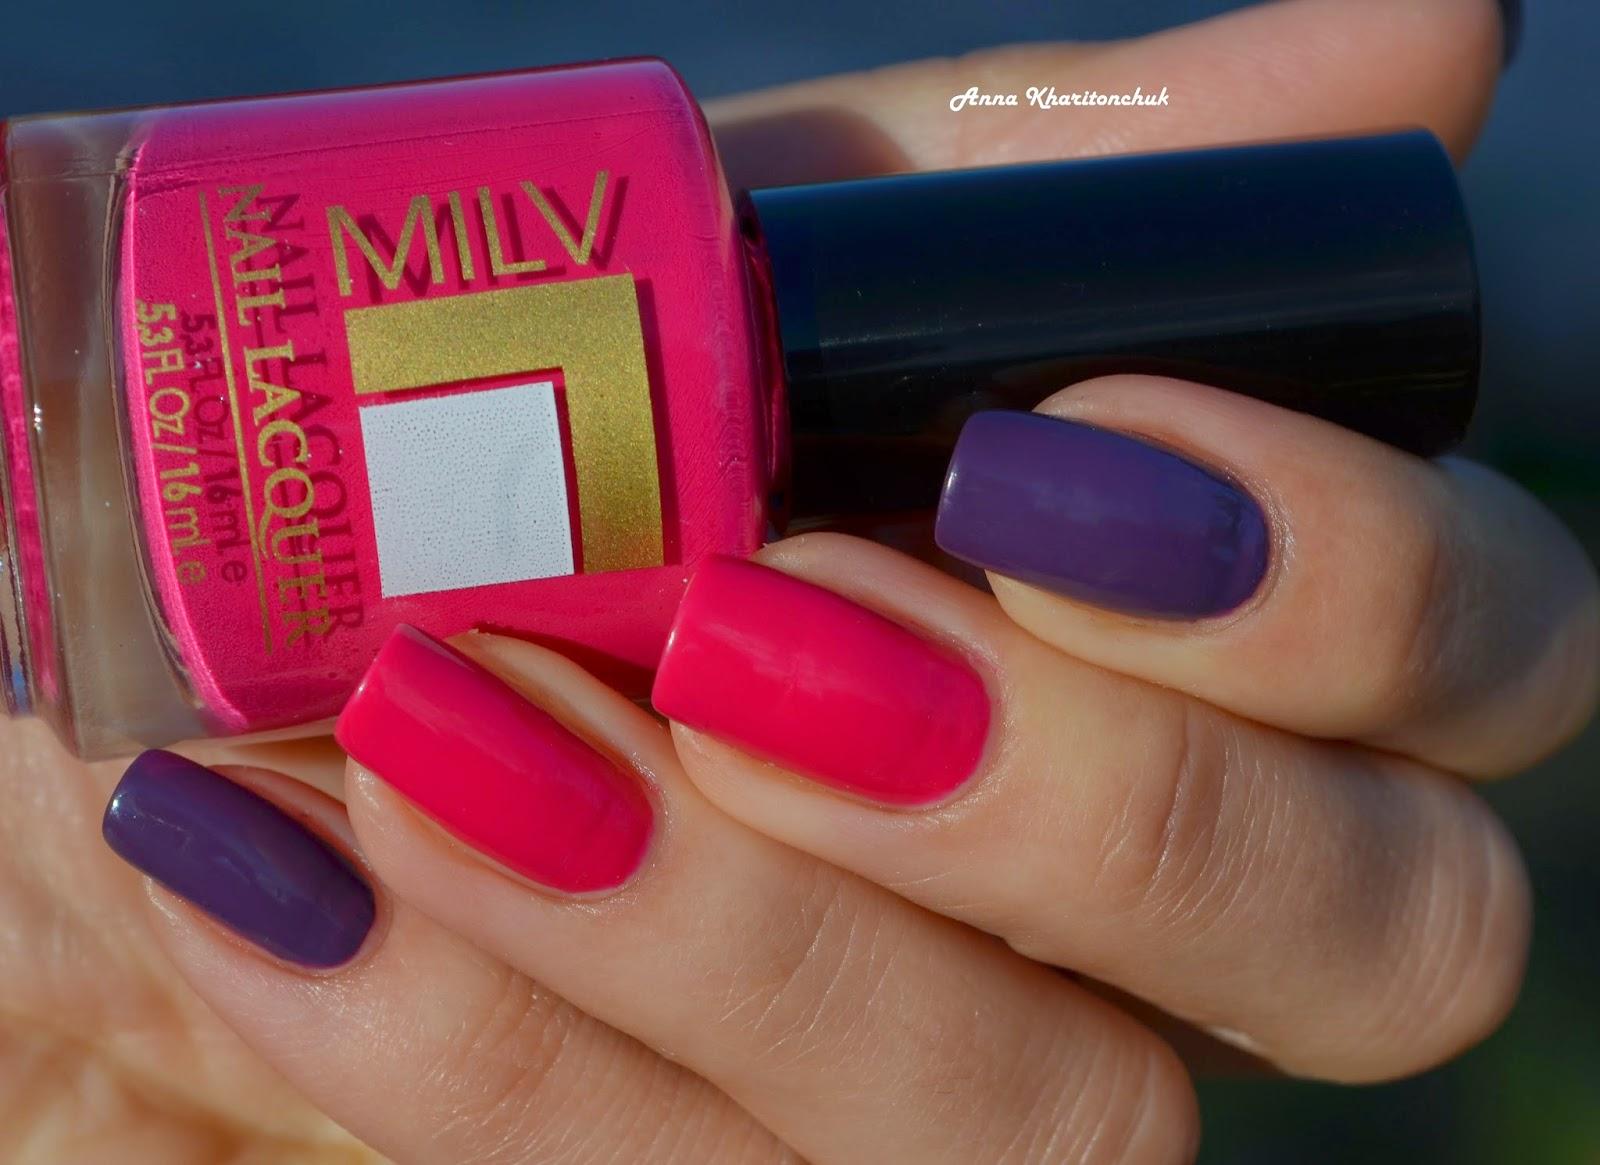 Milv # 52 и Milv # 61 + слайдер дизайн